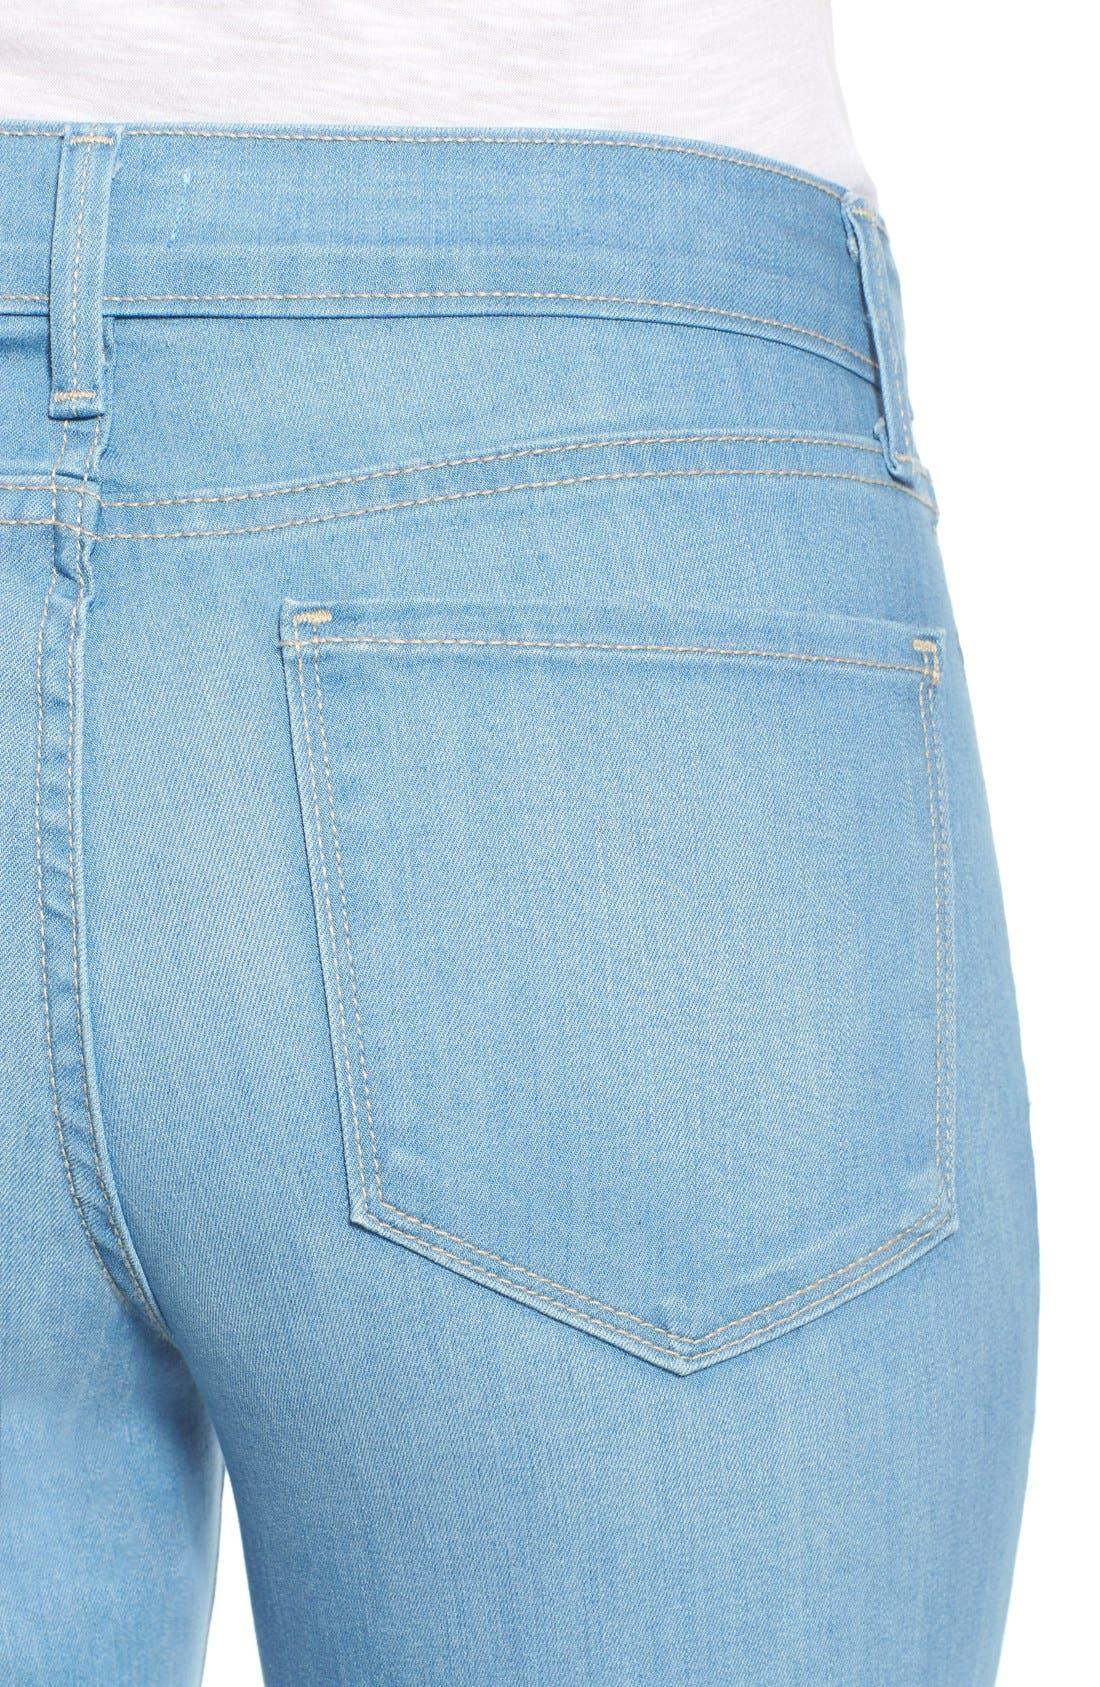 Alternate Image 4  - NYDJ 'Sophia' Stretch Ankle Flare Leg Jeans (Palm Bay)